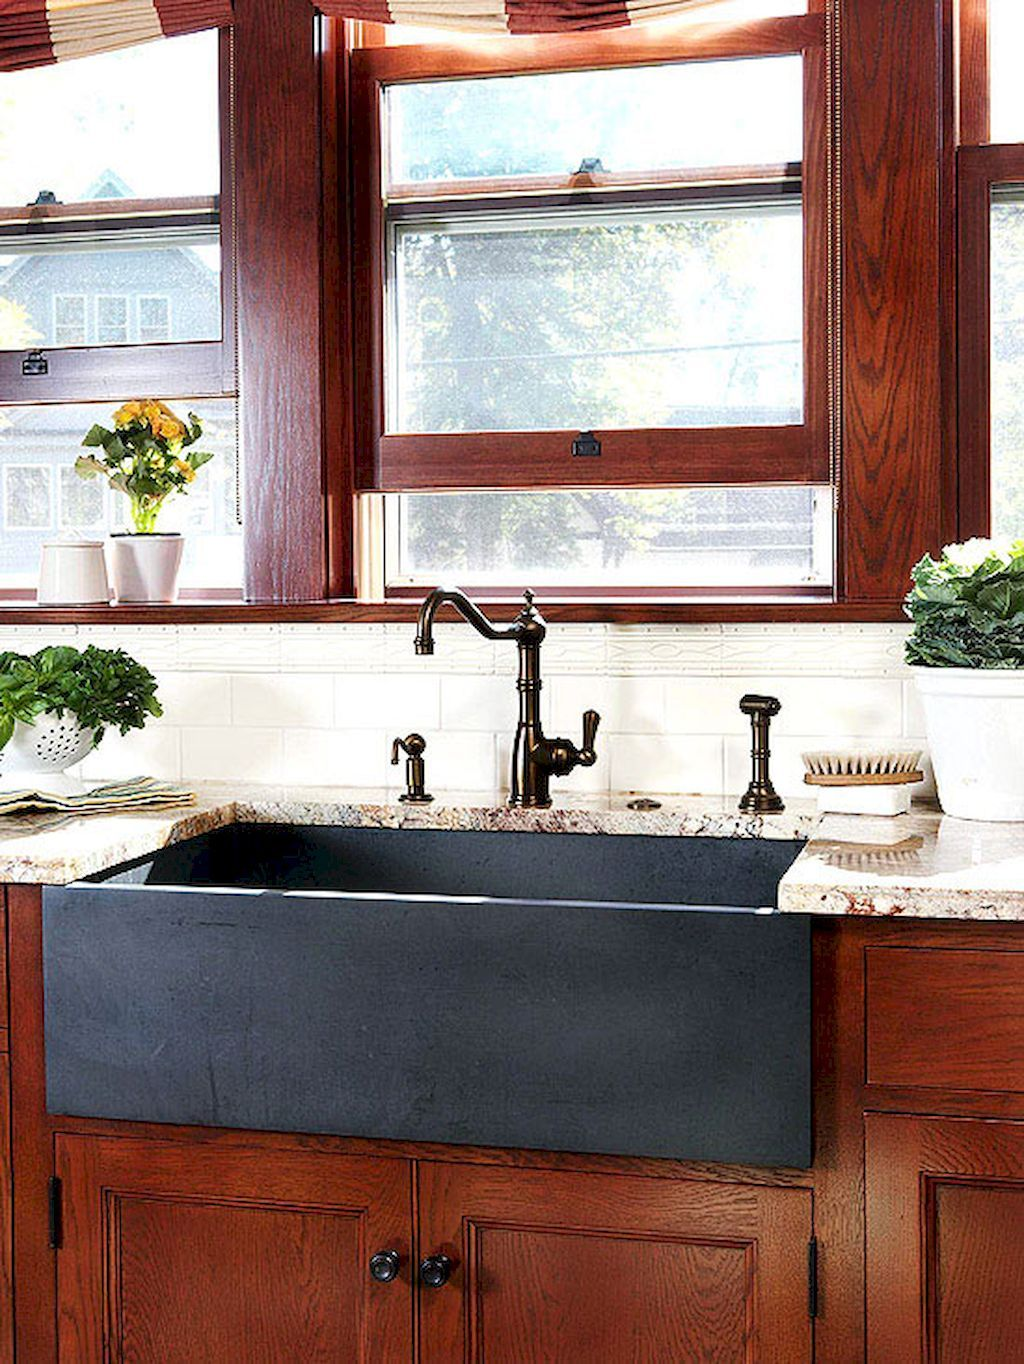 65 modern farmhouse kitchen sink ideas farmhouse sink kitchen apron sink kitchen kitchen on kitchen sink ideas id=84232